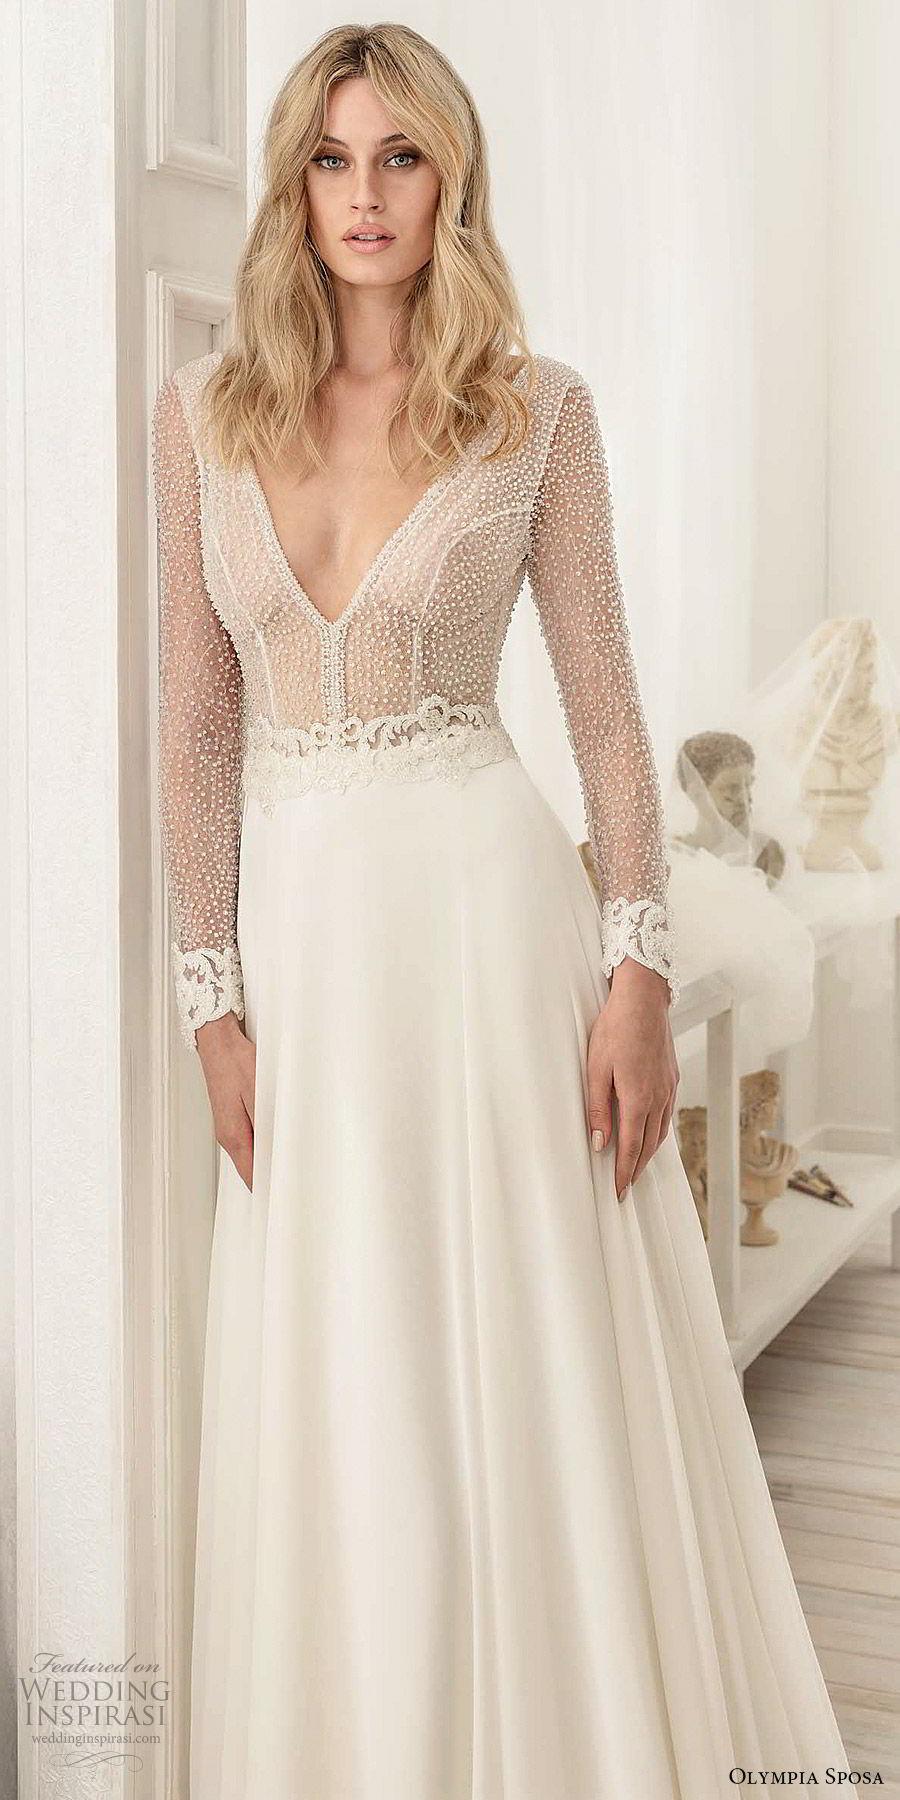 olympia sposa 2020 bridal illusion long sleeves deep v neckline sheer embellished bodice a line ball gown wedding dress (8) elegant modern sexy chapel train zv